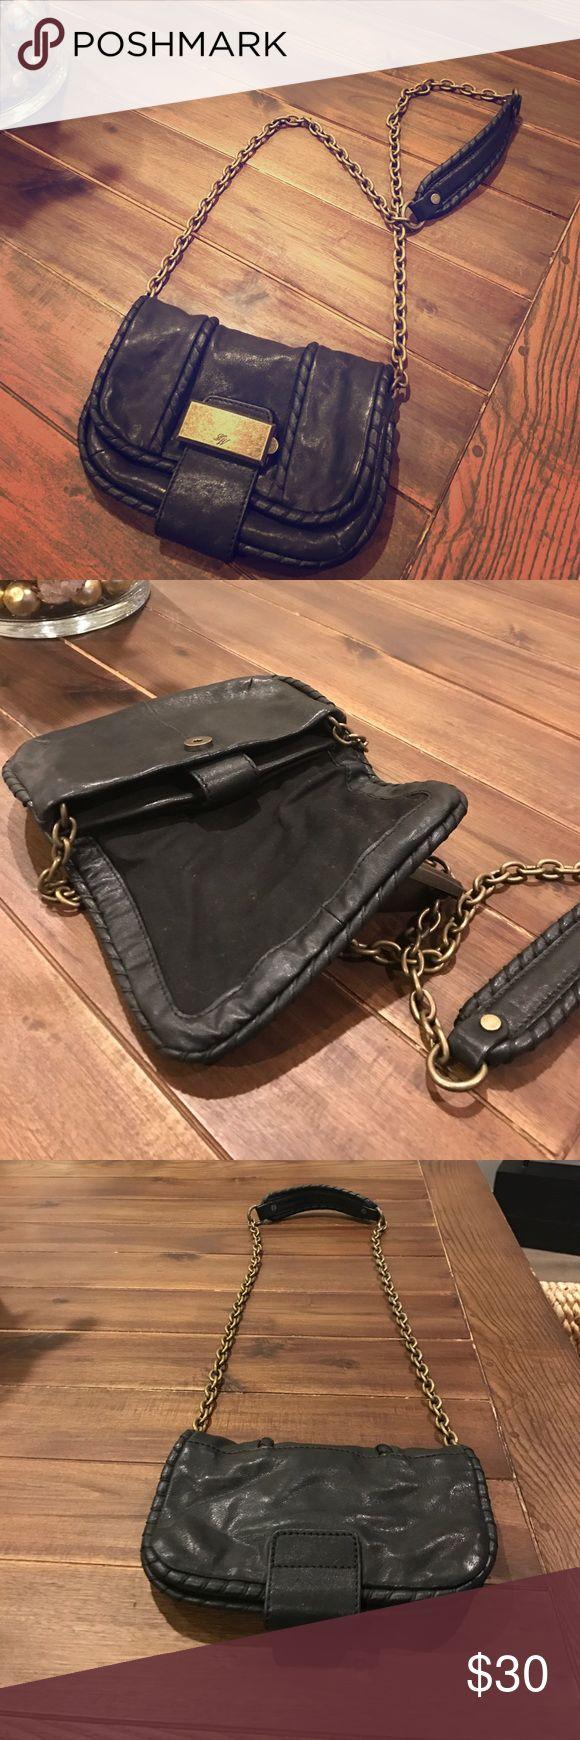 Zara purse Black leather Crossbody purse. Like new Zara Bags Crossbody Bags